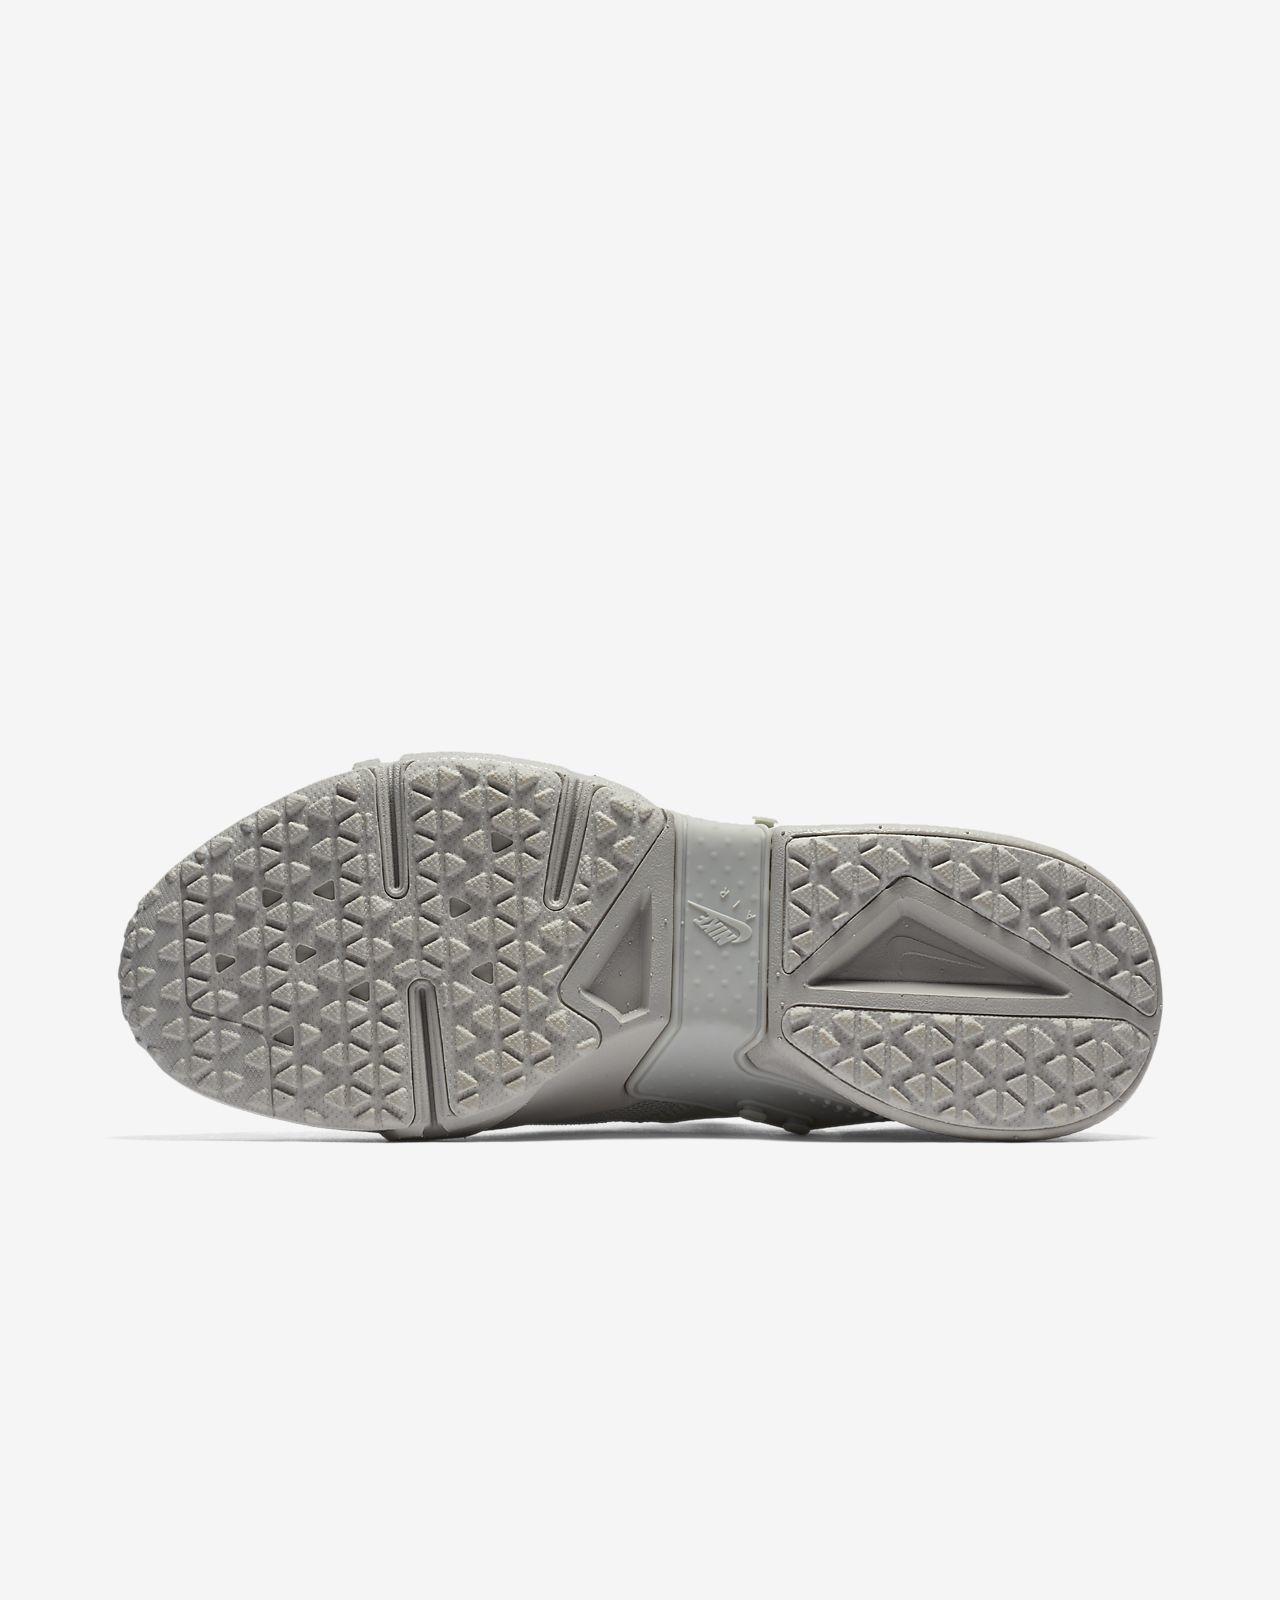 ... Nike Air Huarache Drift Men's Shoe